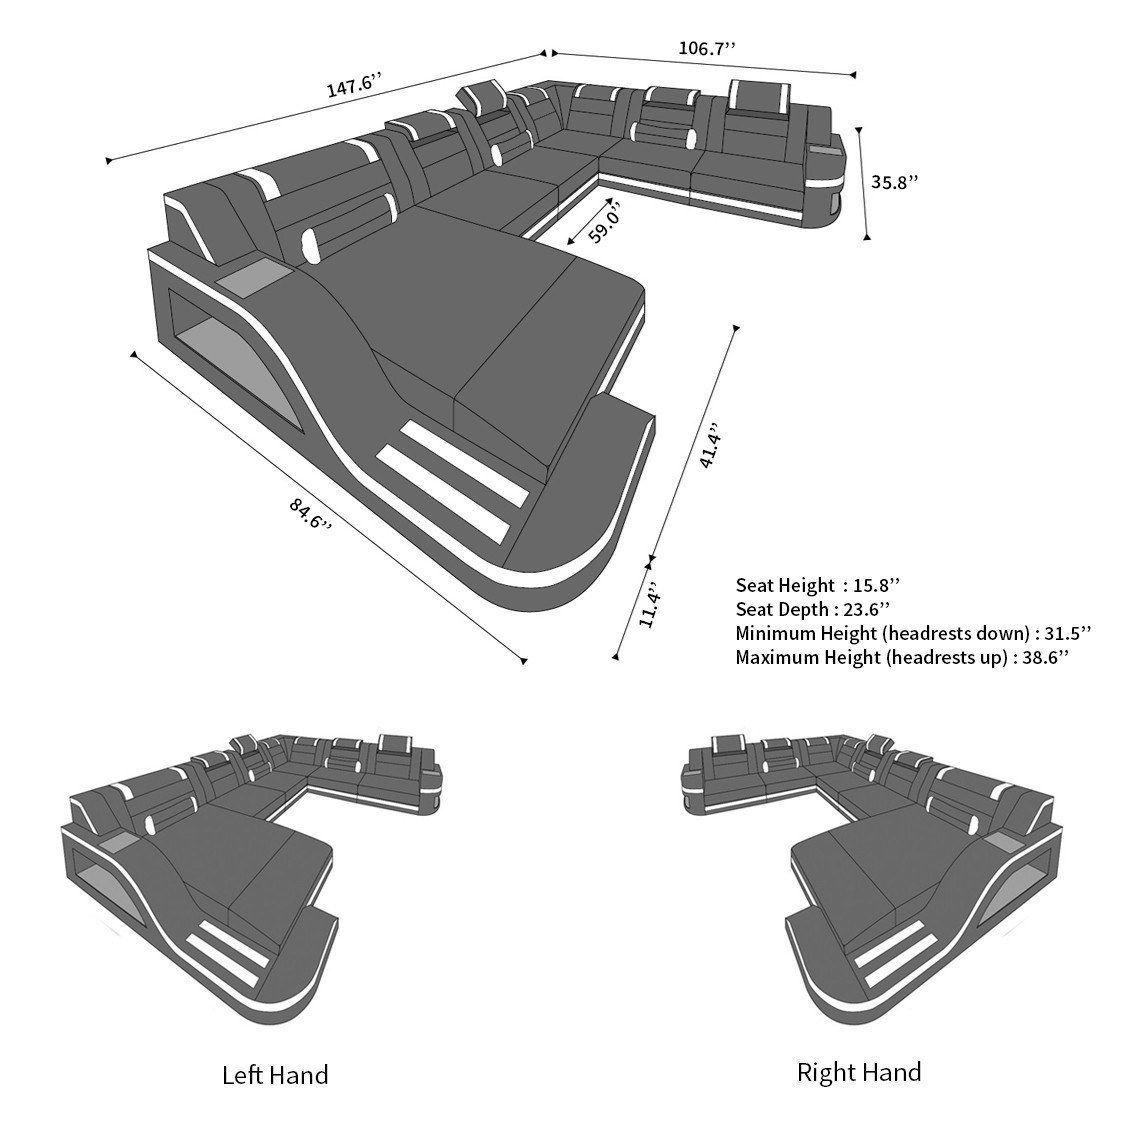 Design Sectional Sofa Detroit Led Xl Shape In 2020 Modern Fabric Sofa Sectional Sofa Fabric Sofa